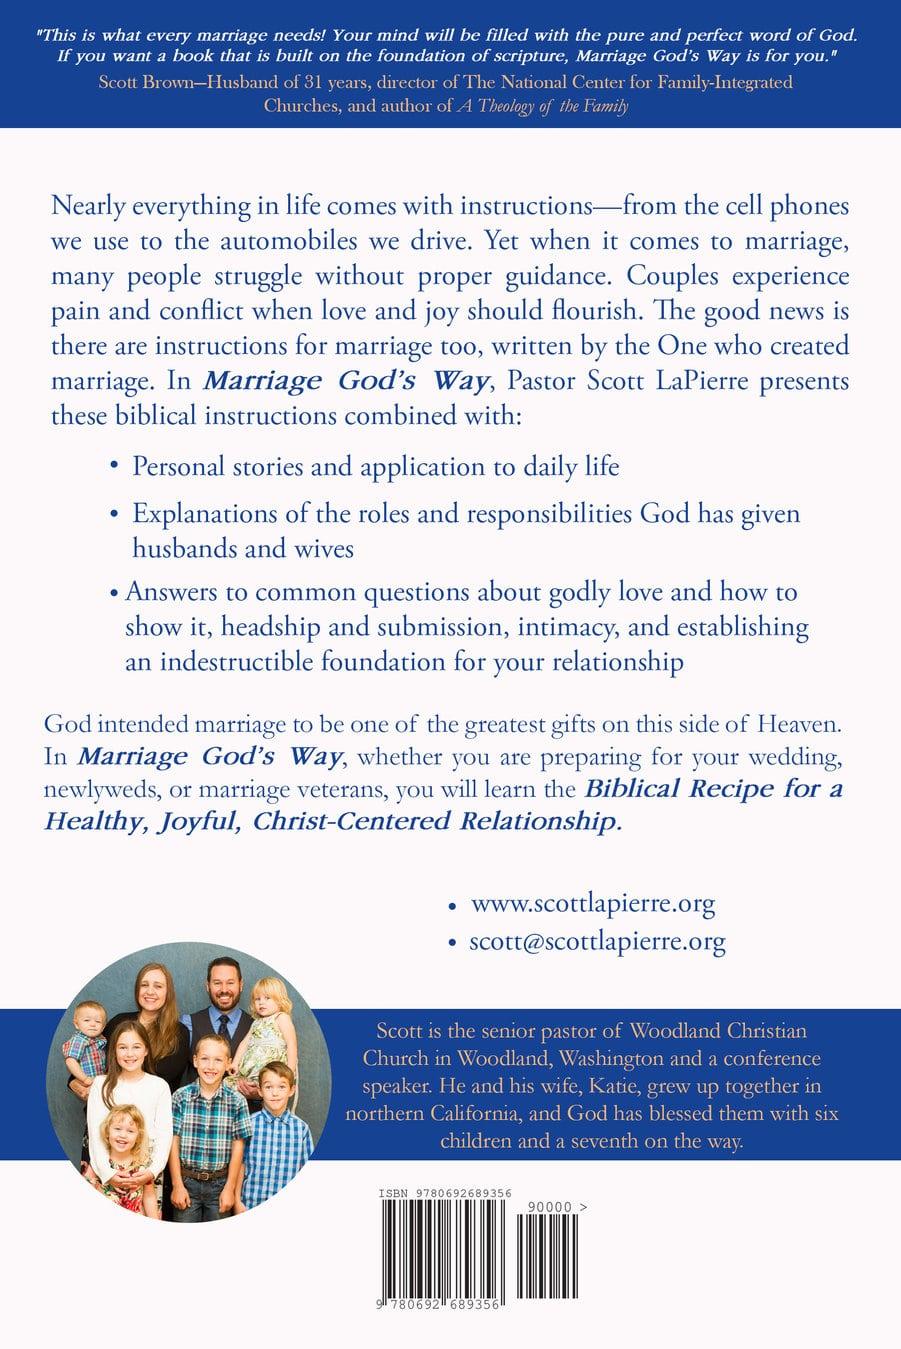 Marriage God's Way—20% off - Scott LaPierre